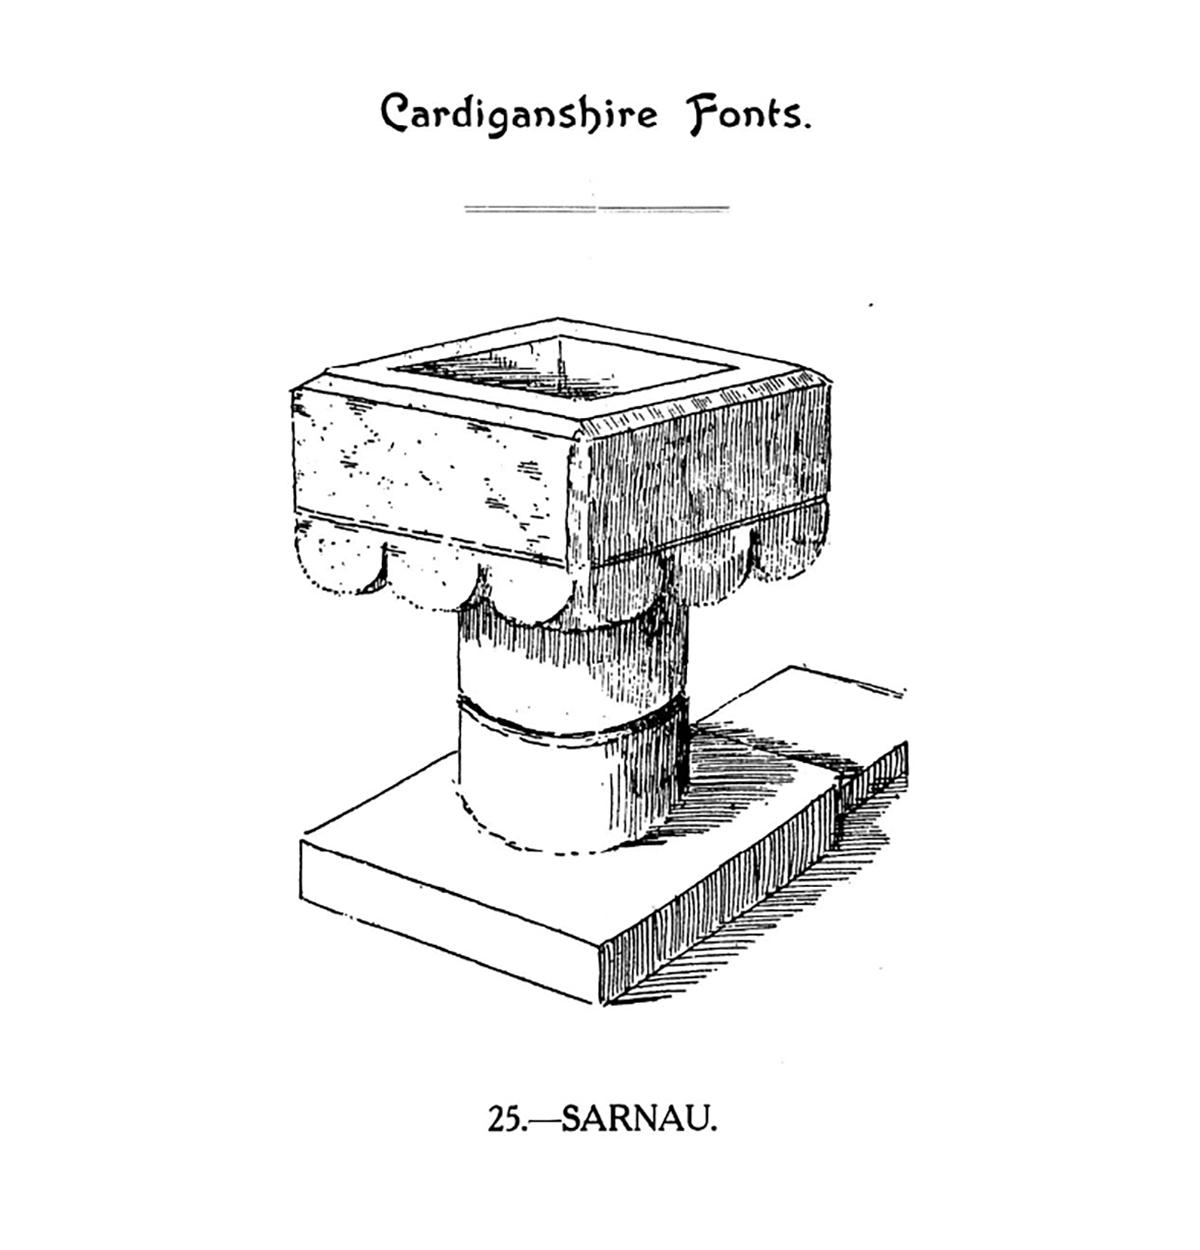 Cardiganshire Fonts - Sarnau